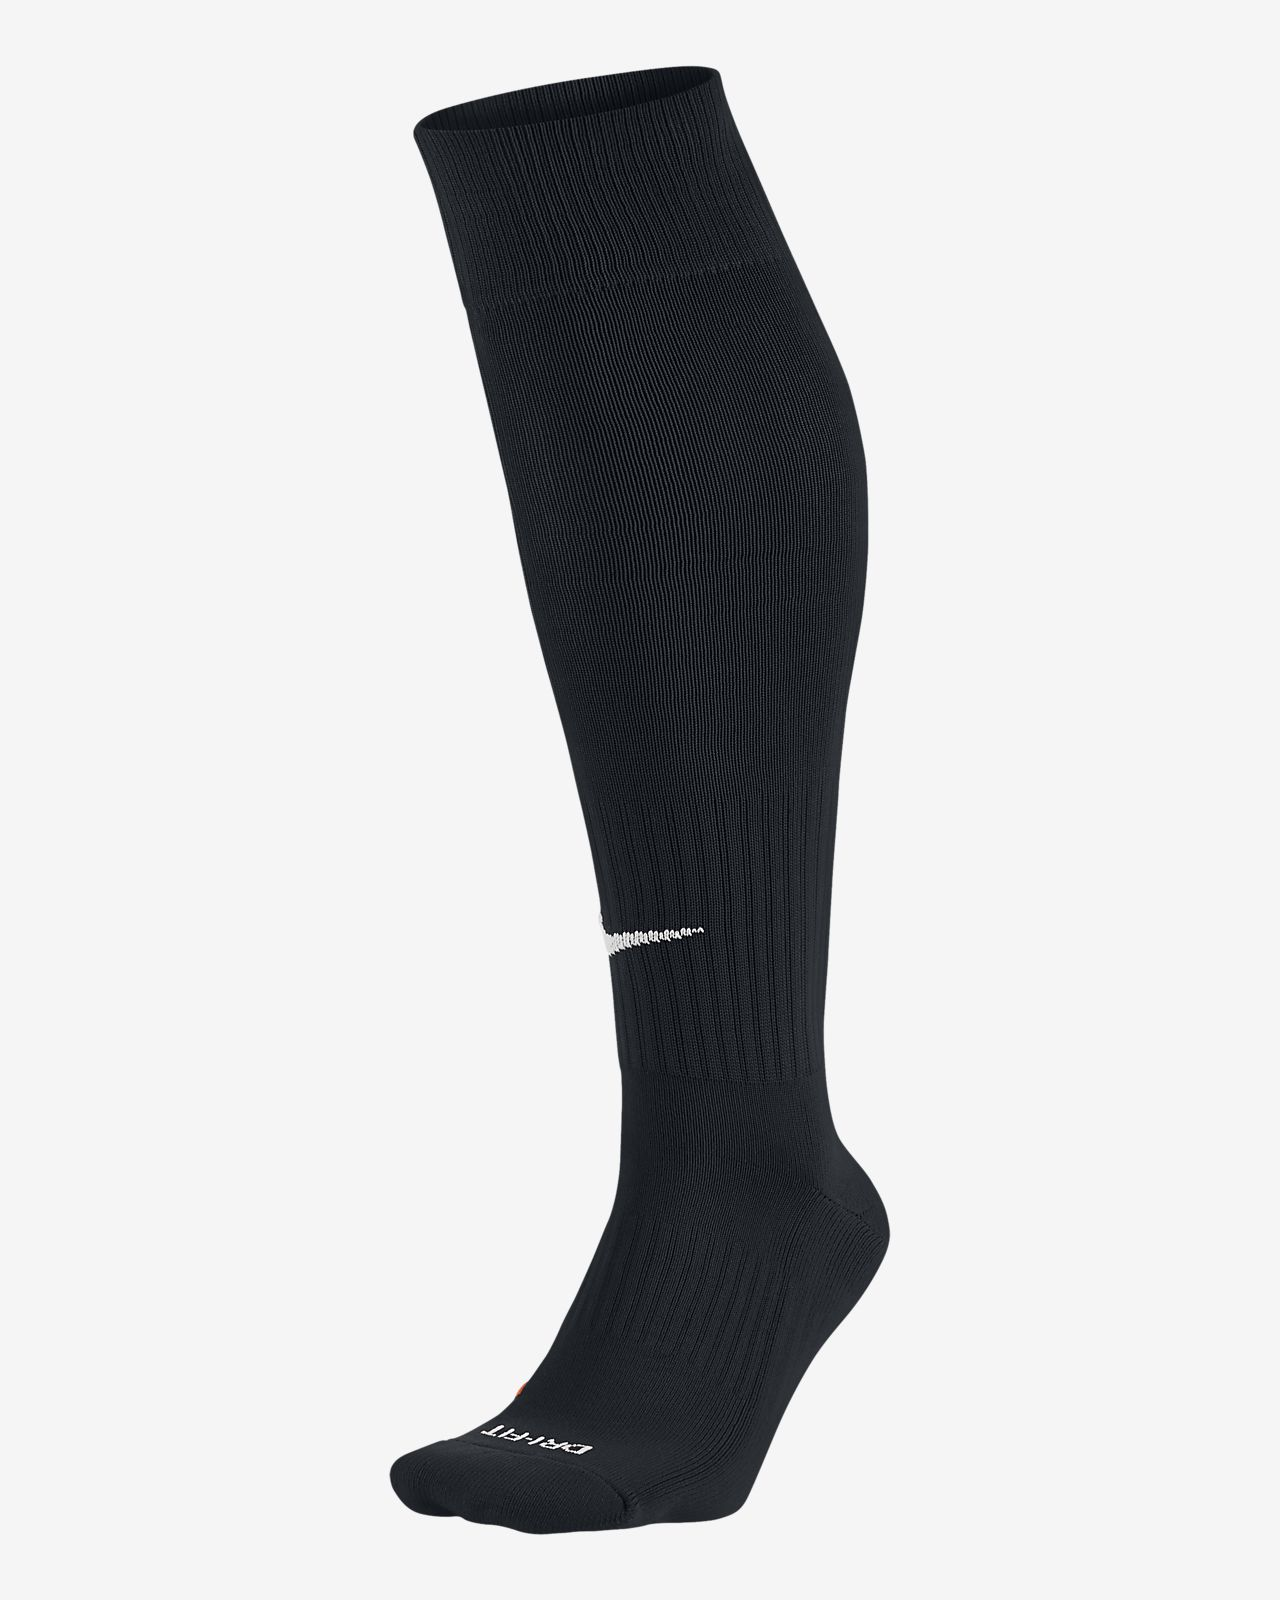 chaussettes nike football noir et orange